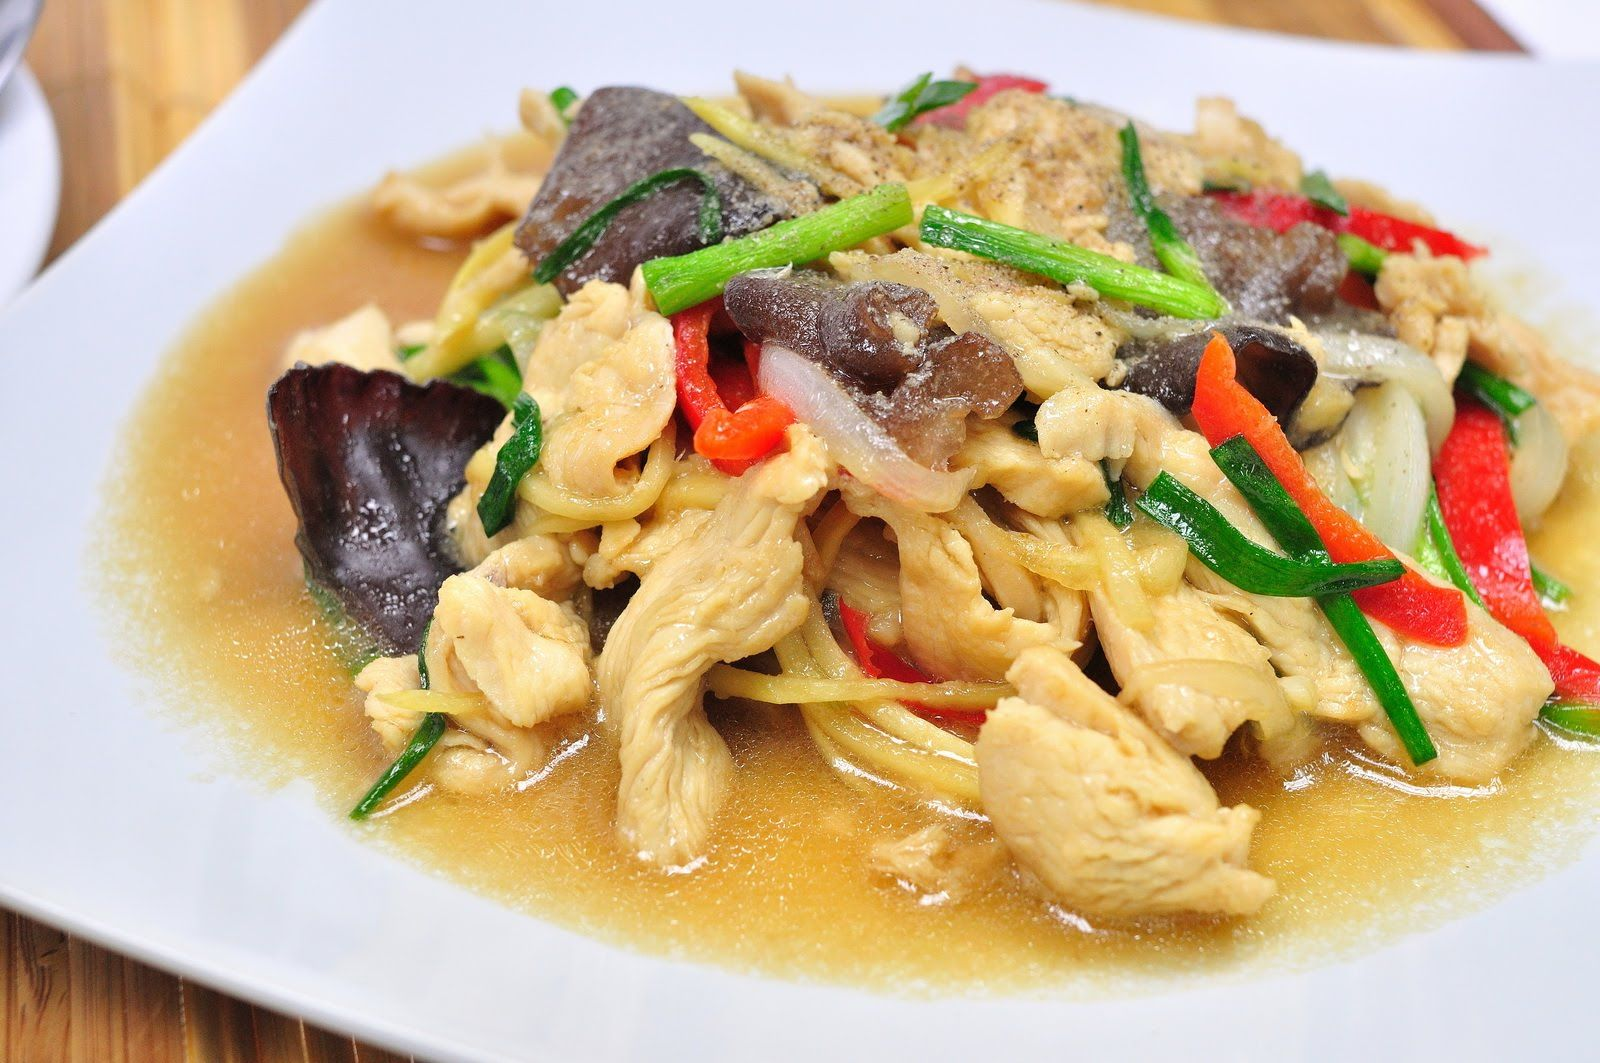 Stir fried chicken with ginger thai food gai pad king stir fried chicken with ginger thai food gai pad king forumfinder Images